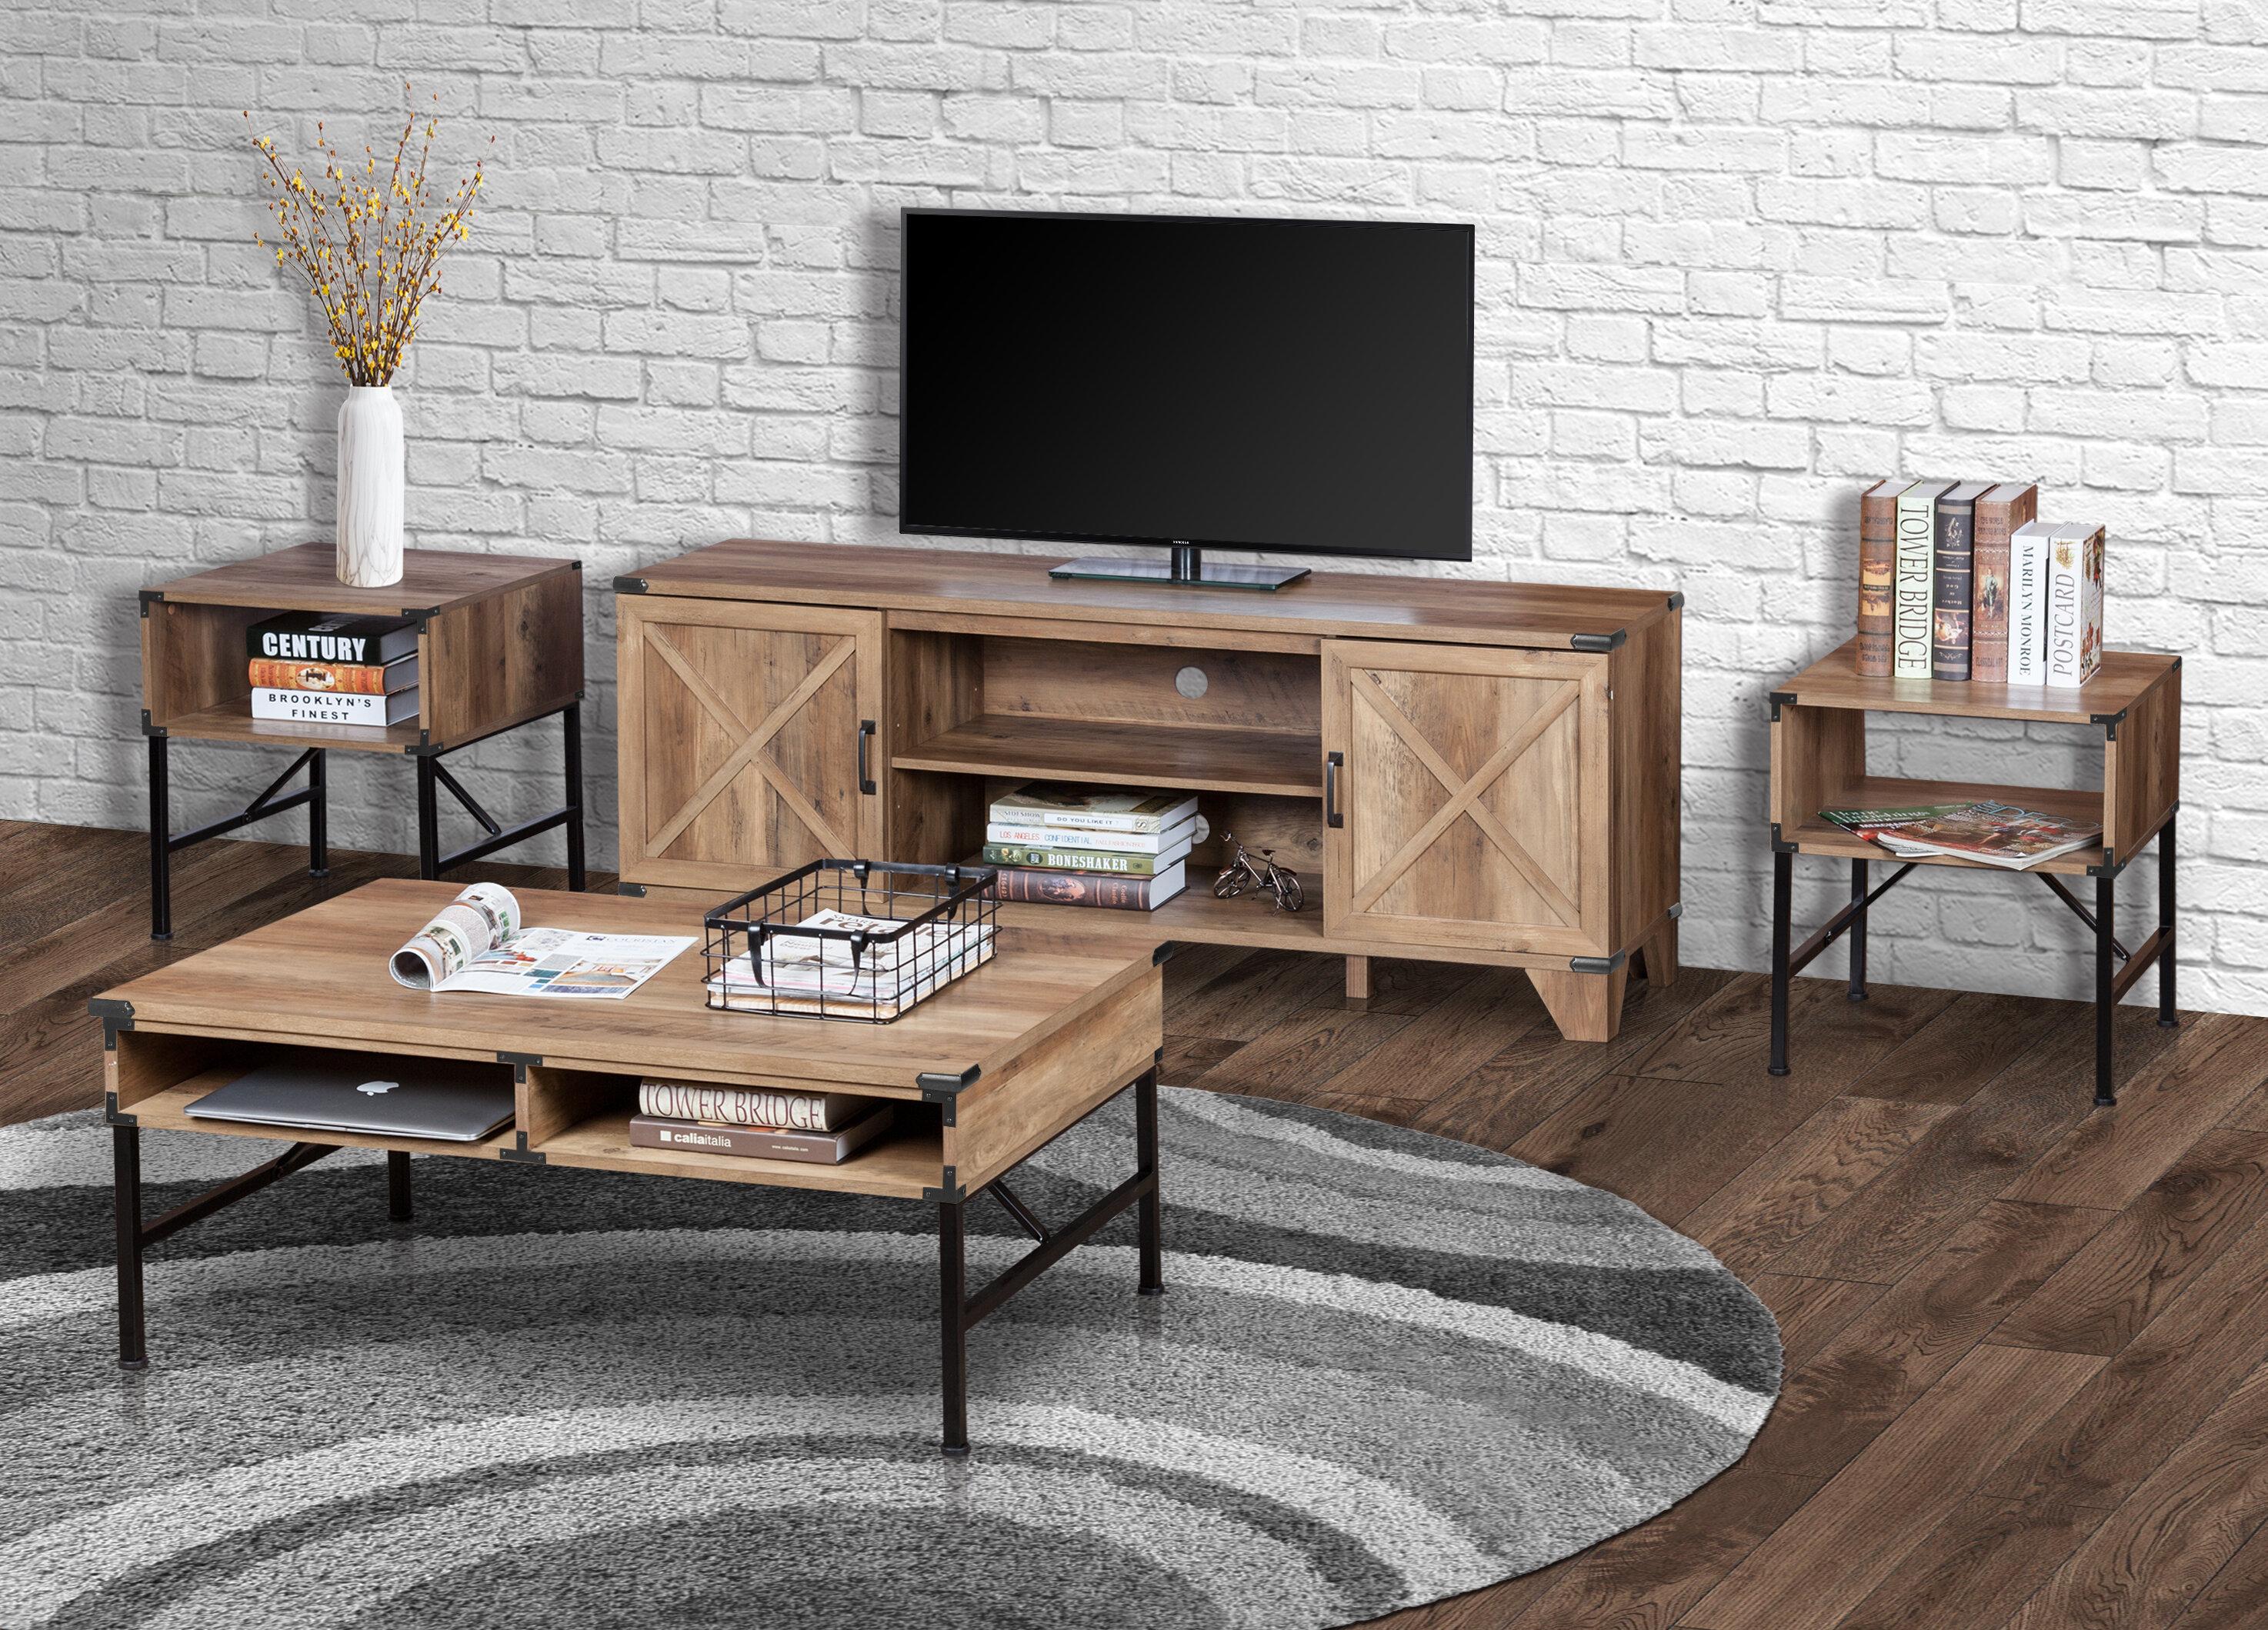 - Laurel Foundry Modern Farmhouse Johan 3 Piece Coffee Table Set